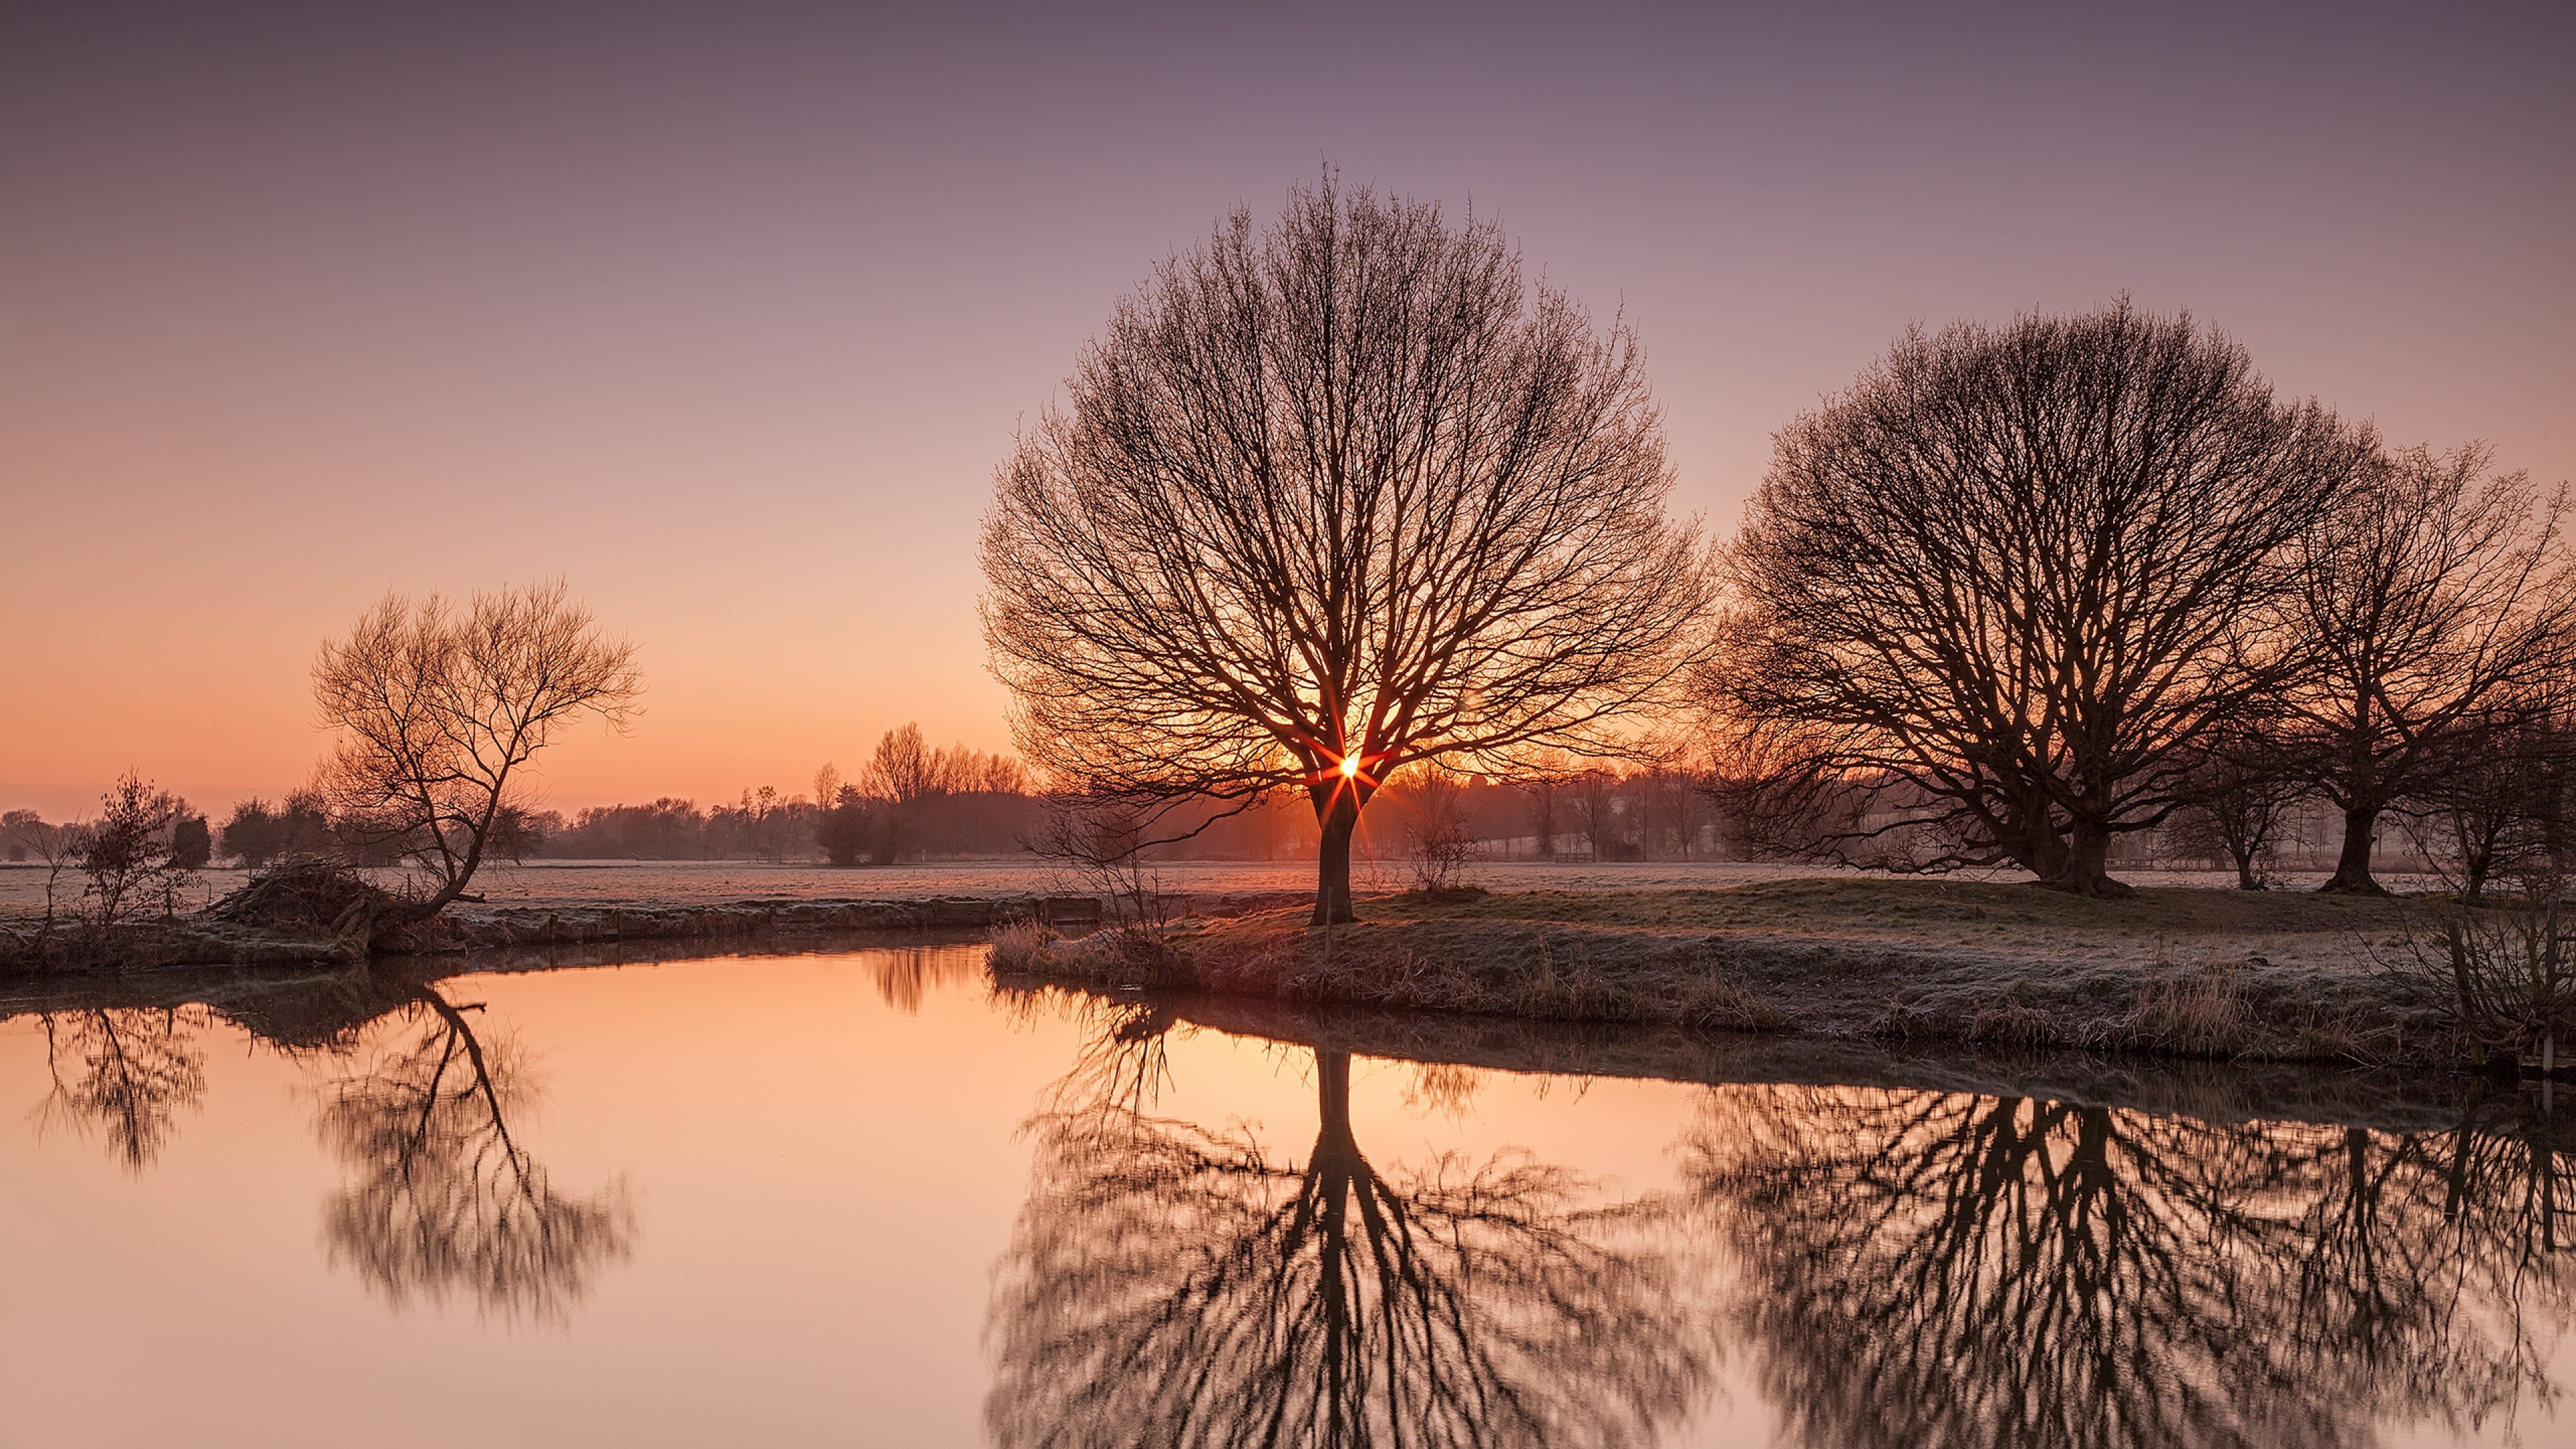 light dawn 1535924031 - Light Dawn - trees wallpapers, river wallpapers, nature wallpapers, light wallpapers